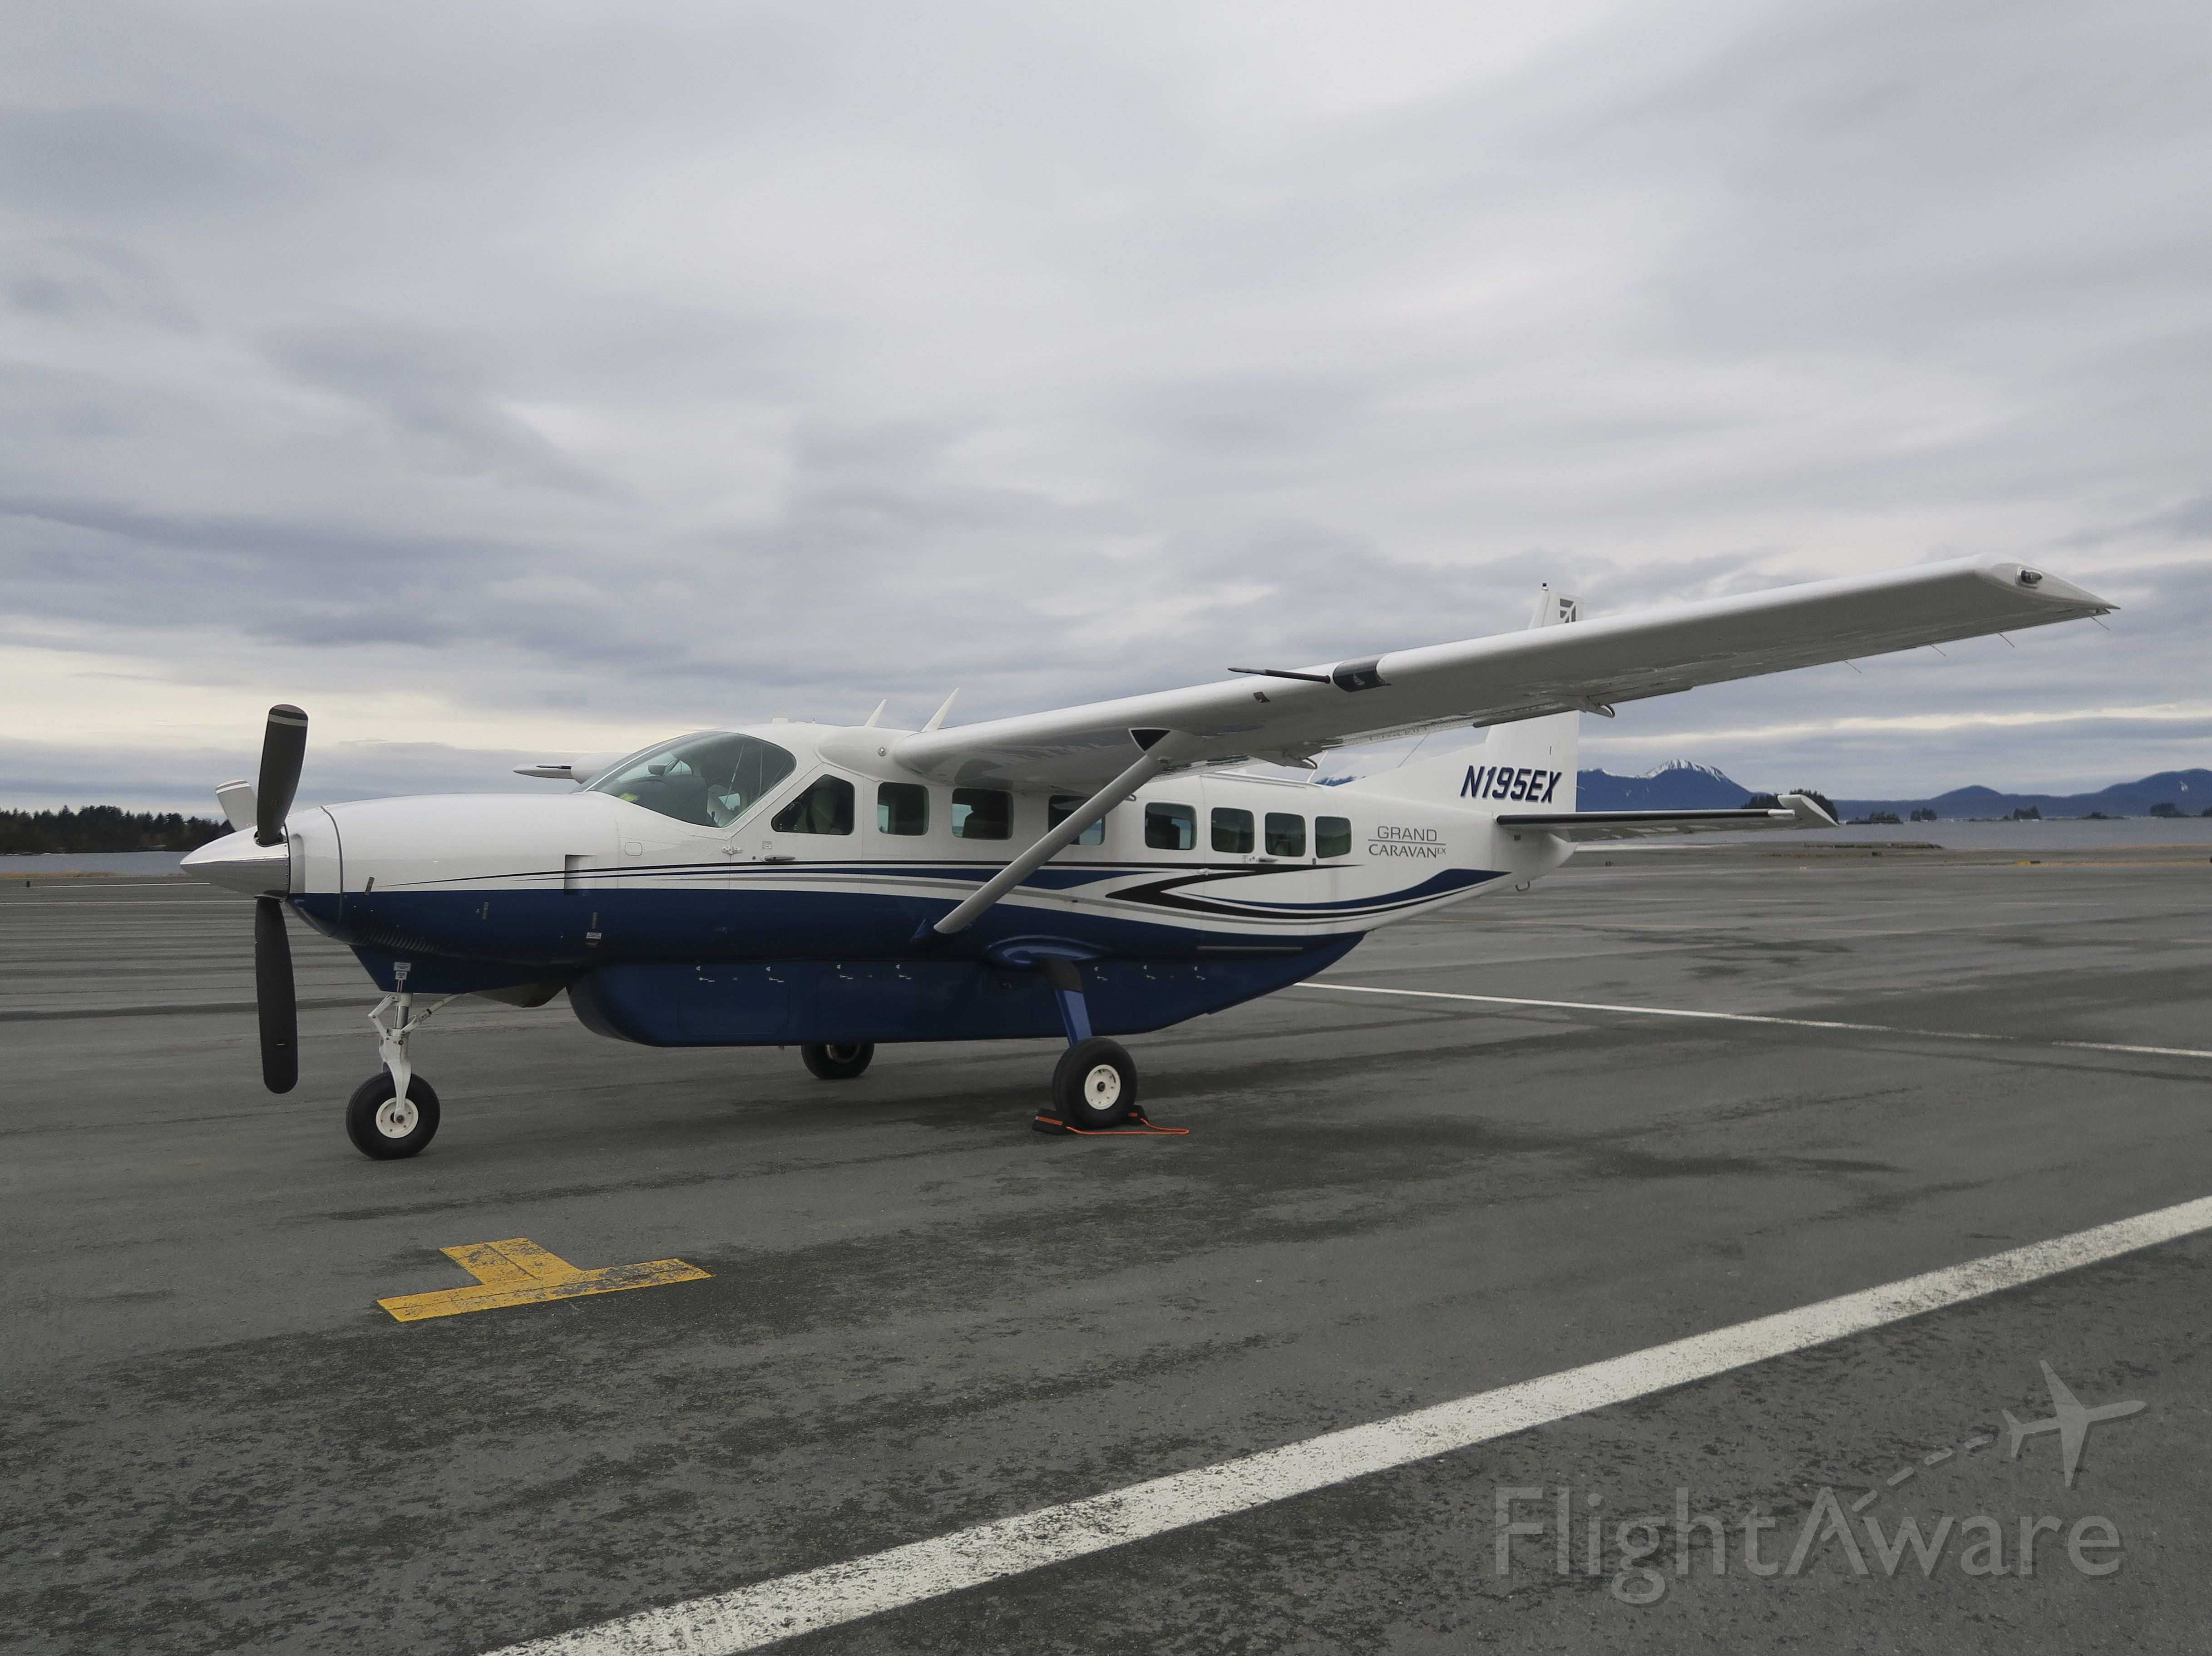 Cessna Caravan (N195EX) - On a ferry flight from Singapore to Wichita, USA. 10 JAN 2016.